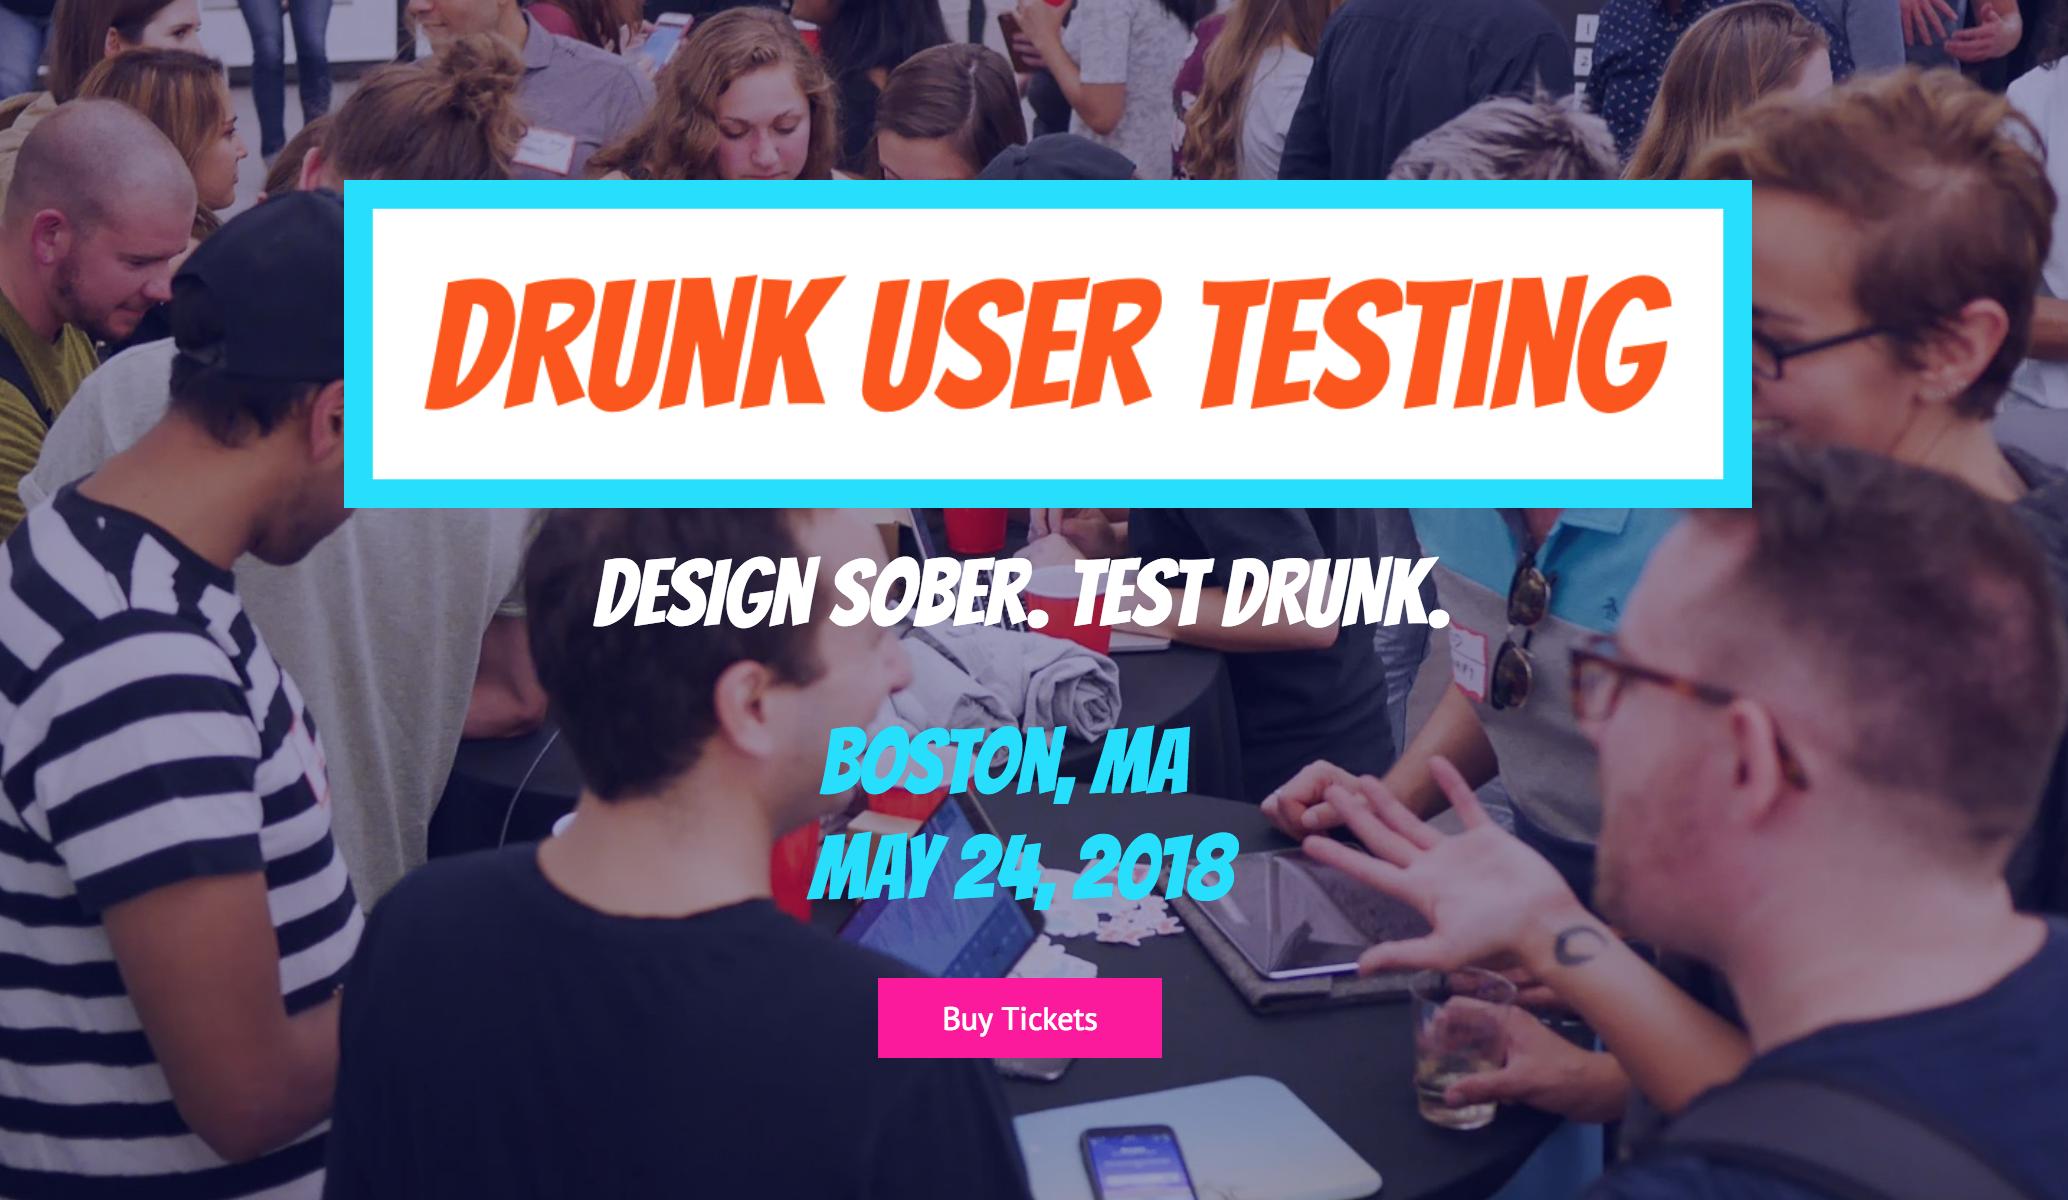 Boston Drunk User Testing